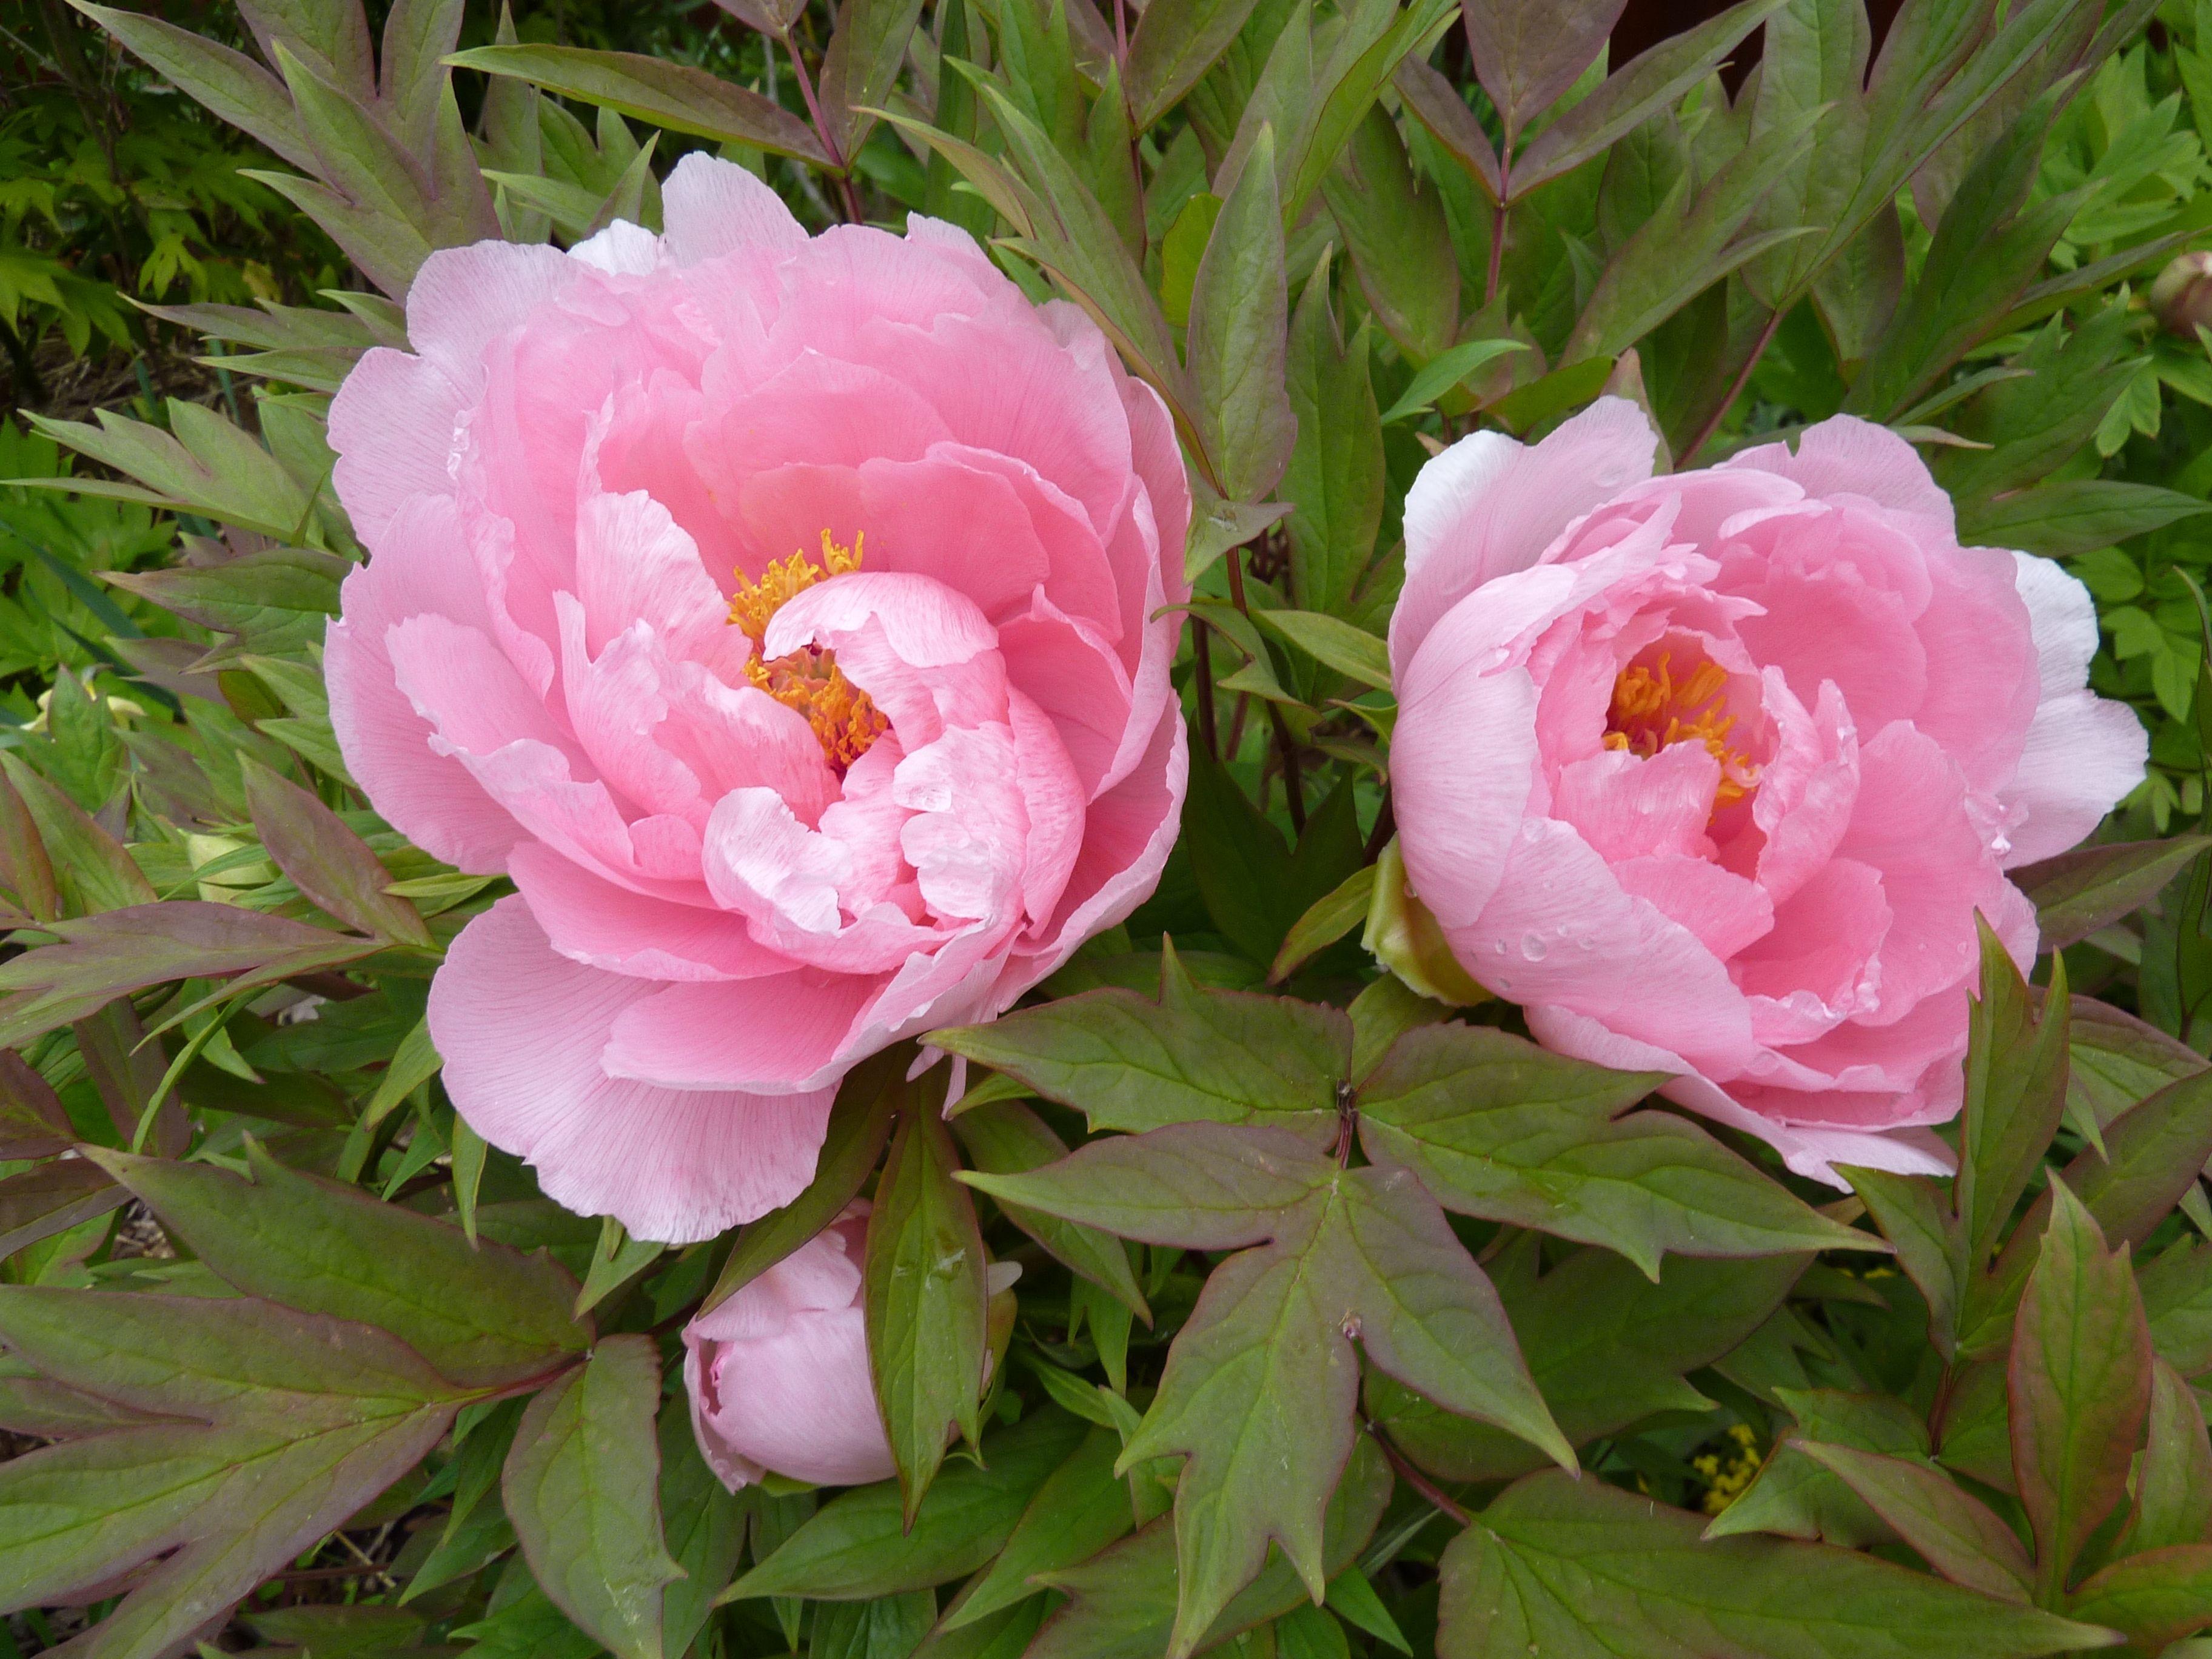 Paeonia Suffruticosa Hanakisoi Flowers Paeonia Lactiflora Plants